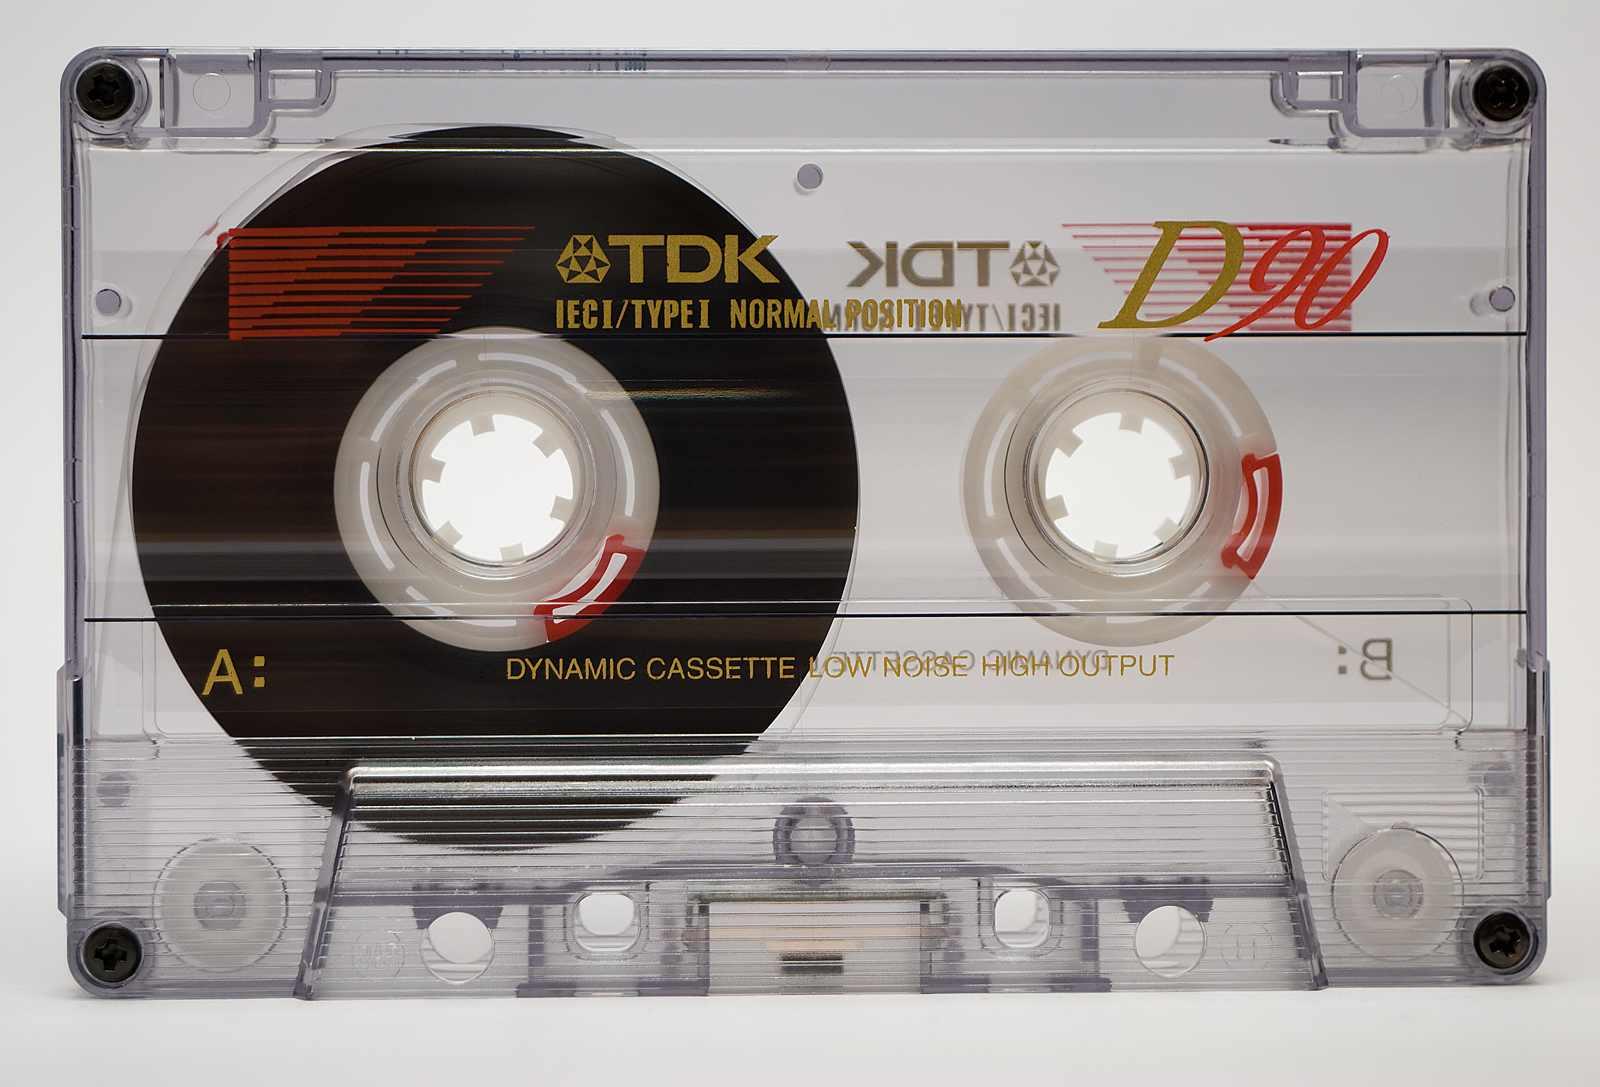 Multimidea Audio video bd: ww songs pk - MP3 Search & Free